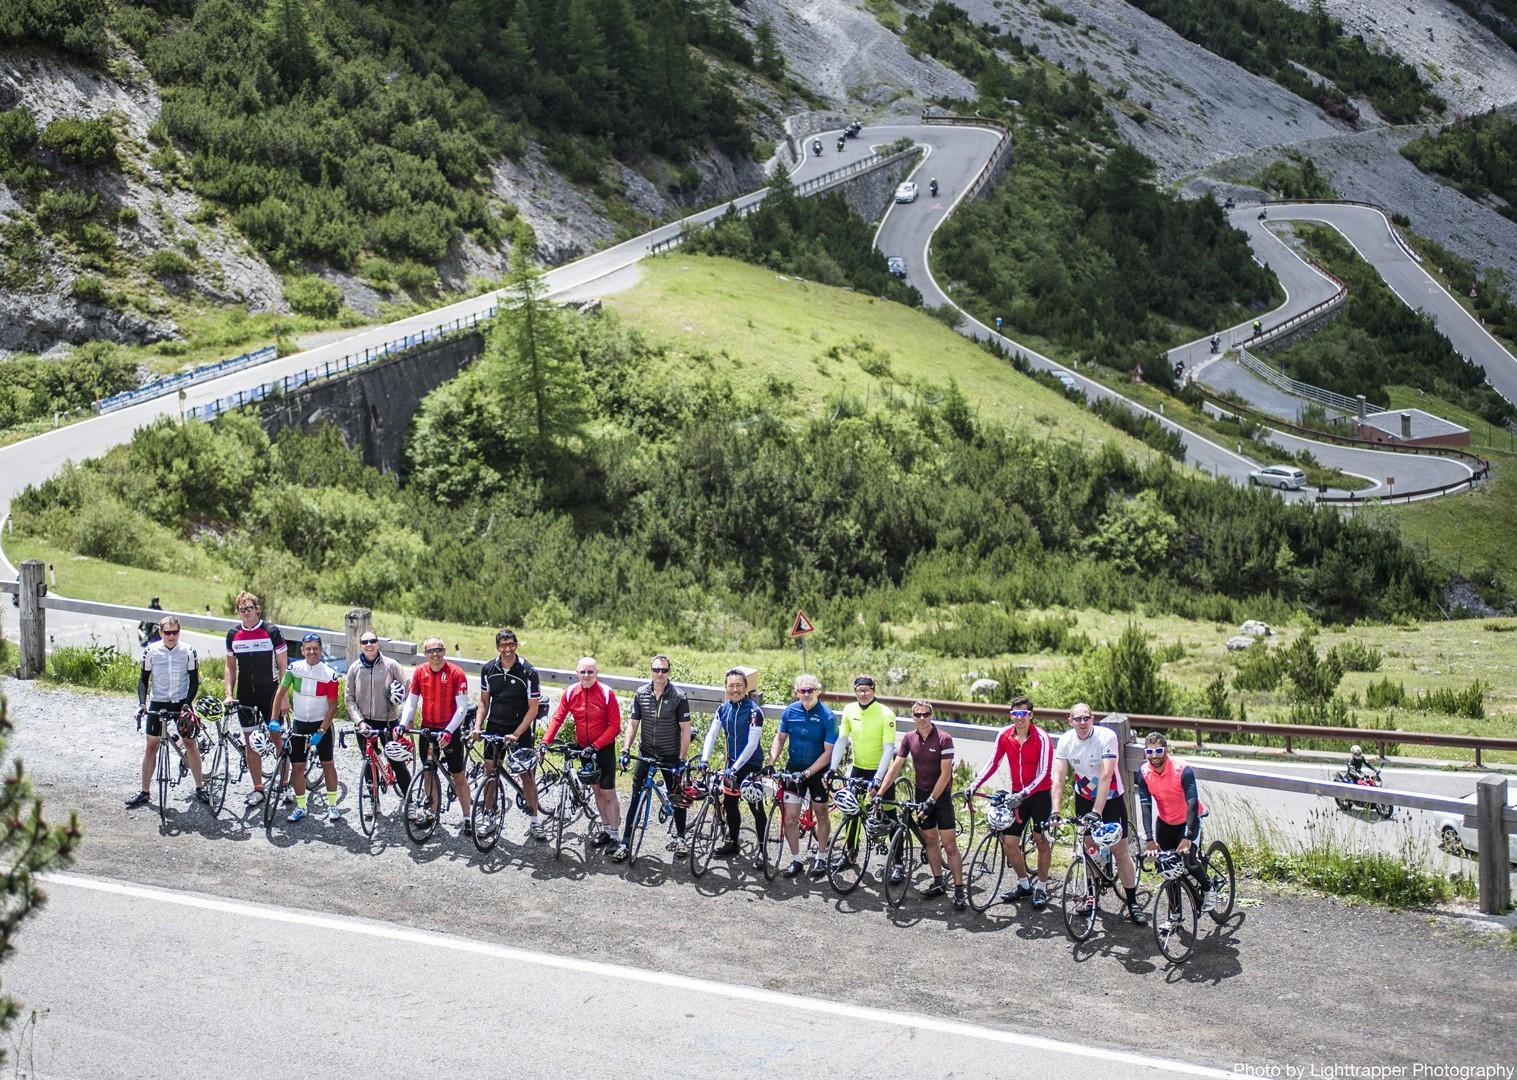 italian-alps-stelvio-guided-road-cycling-holiday.jpg - Italy - Italian Alps Introduction - Guided Road Cycling Holiday - Italia Road Cycling